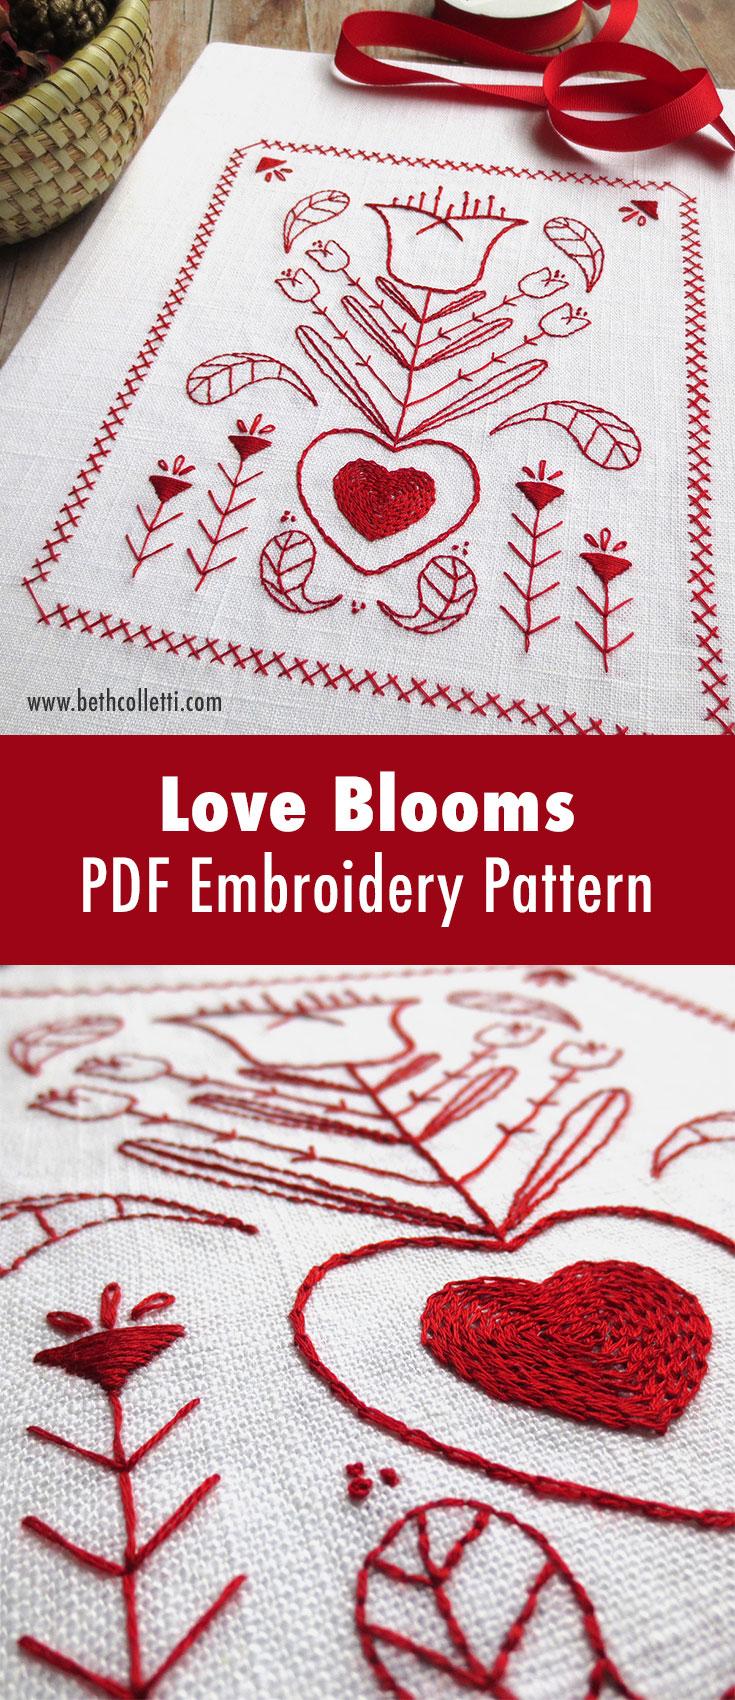 BethColletti_Love_Blooms_Redwork_Pattern.jpg